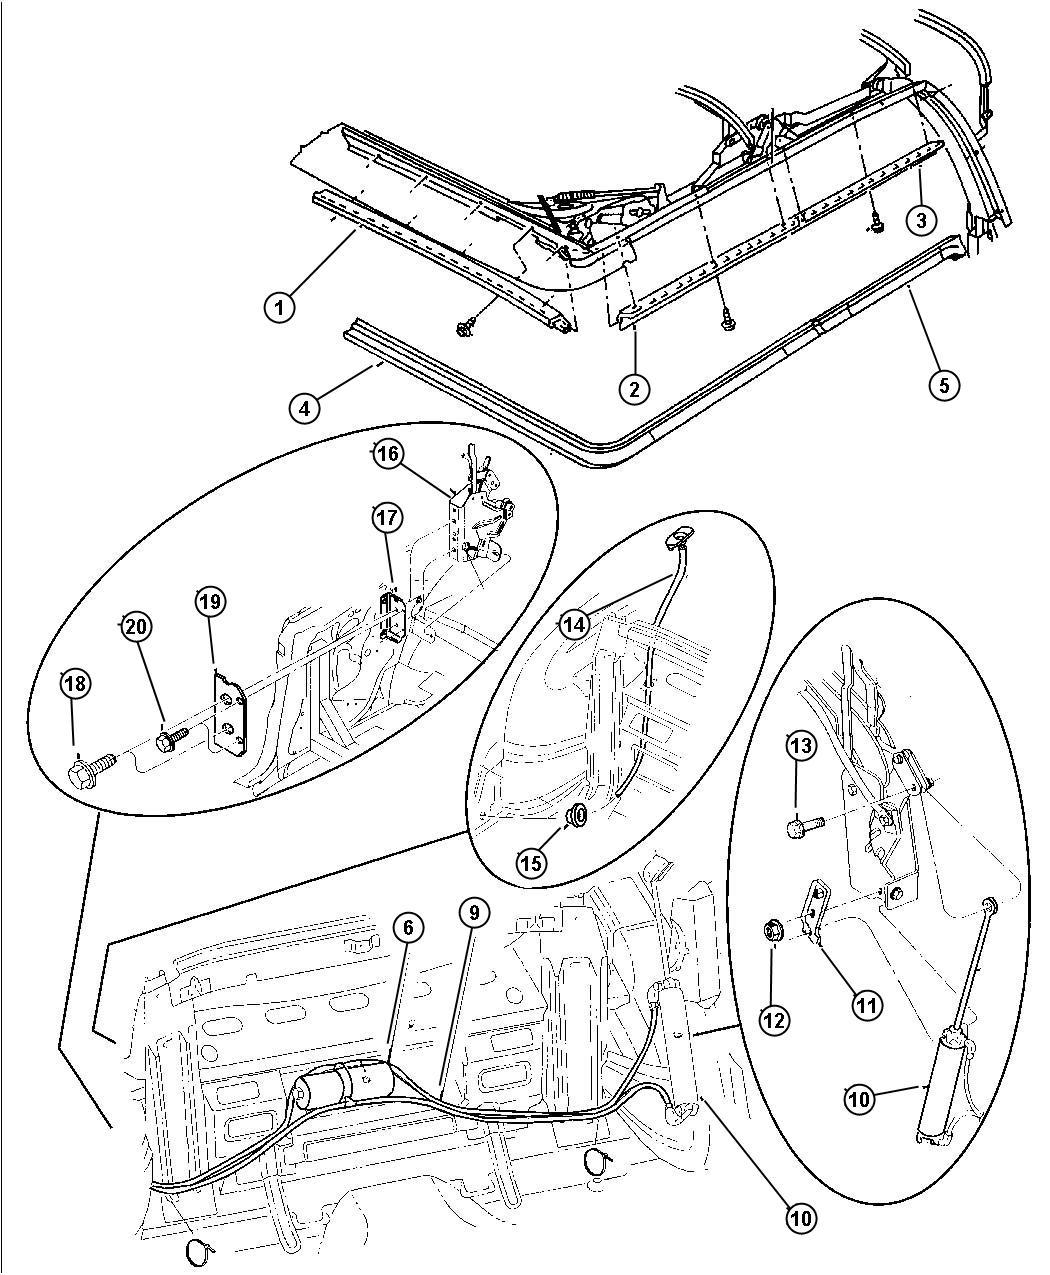 Chrysler Sebring Screw Hex Flange Head Top Folding